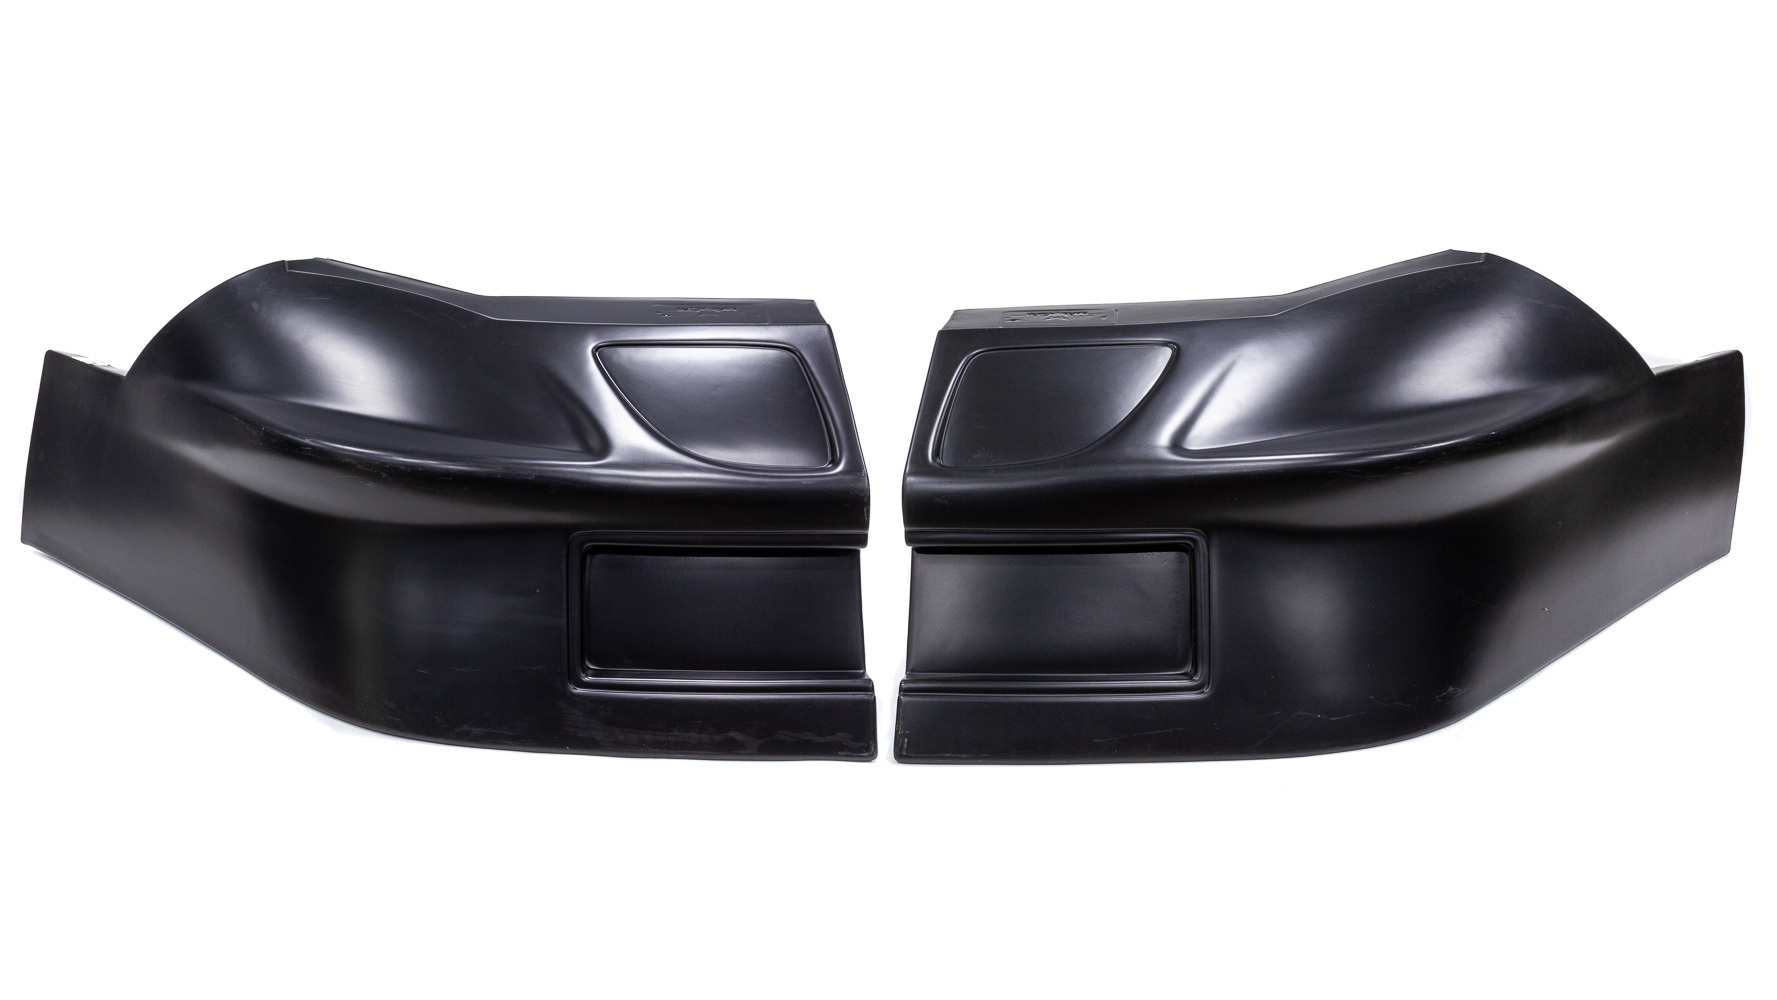 04 Grand Prix Nose Black Plastic